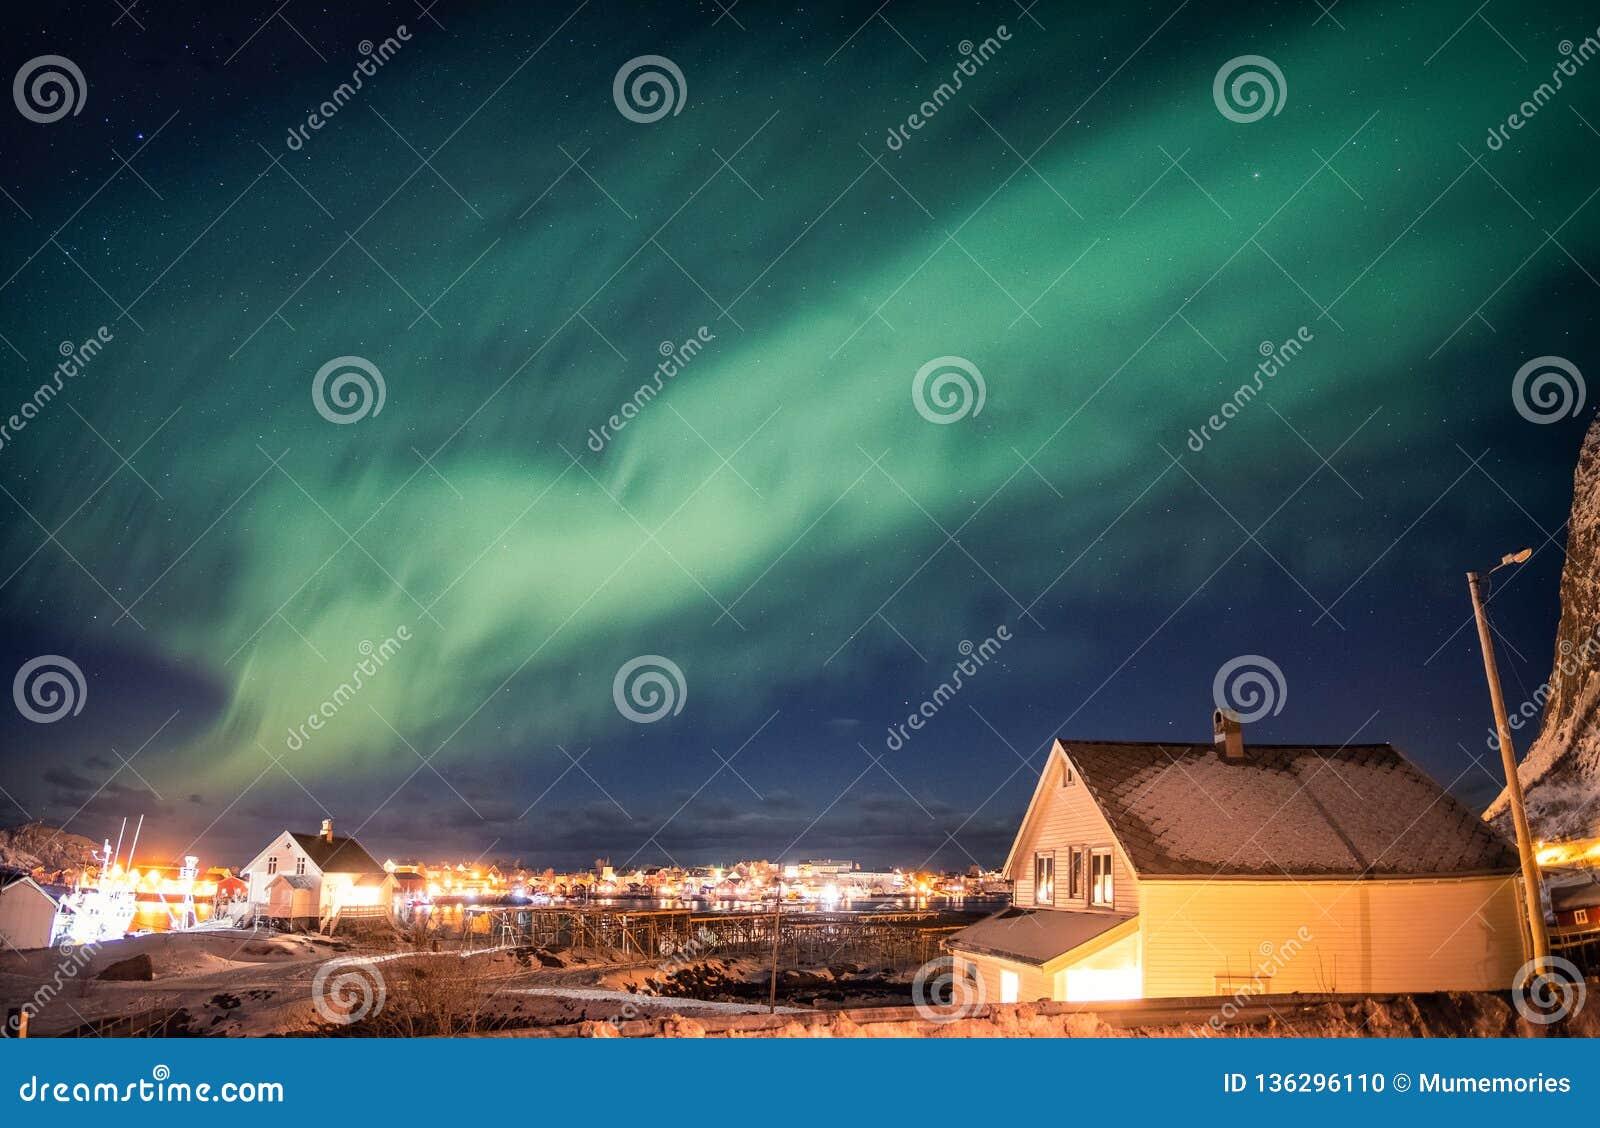 Aurora borealis dancing over scandinavian village